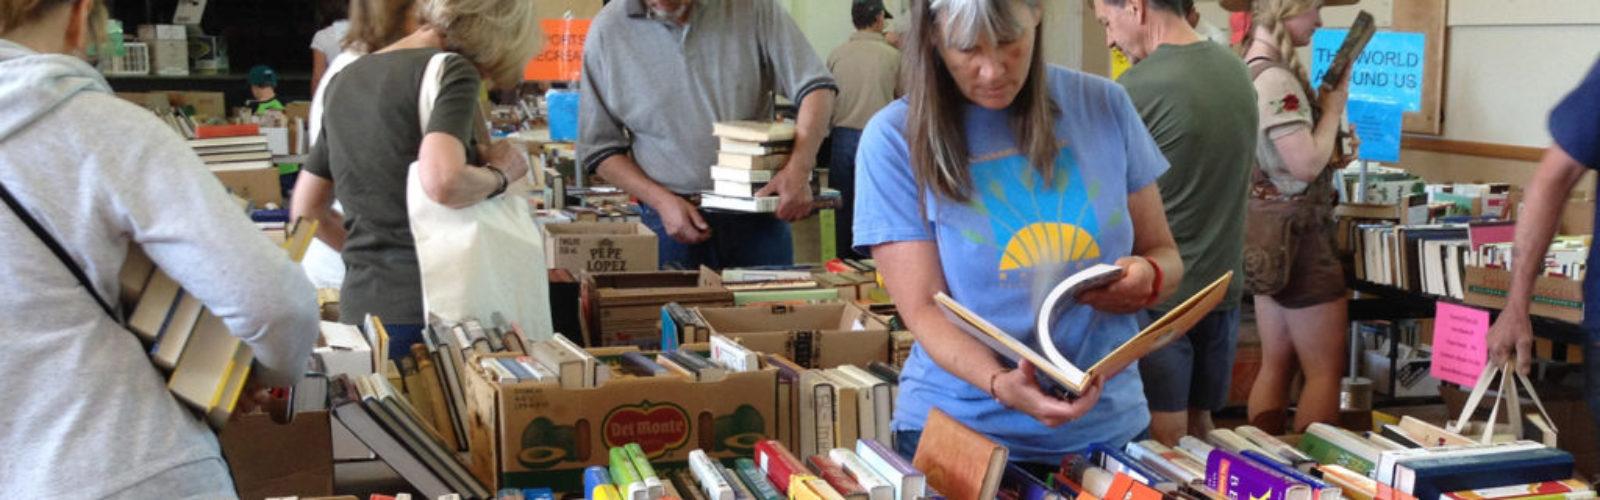 twisp-book-sale